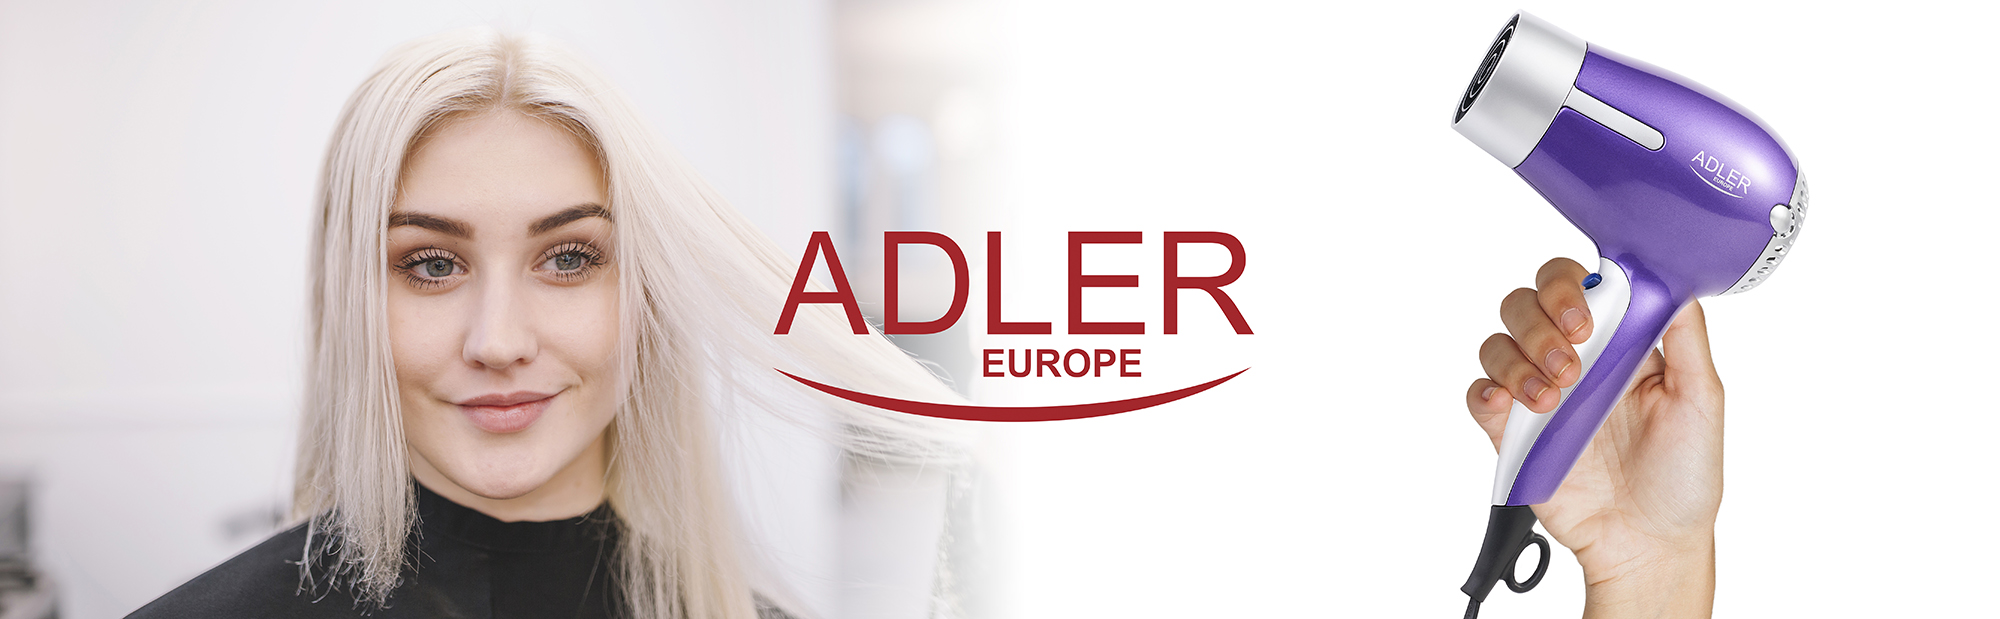 Adler AD 2218 secador de pelo profesional Compacto, 2 ajustes de Velocidad, 3 Temperaturas, Botón Aire Frío, 1500W